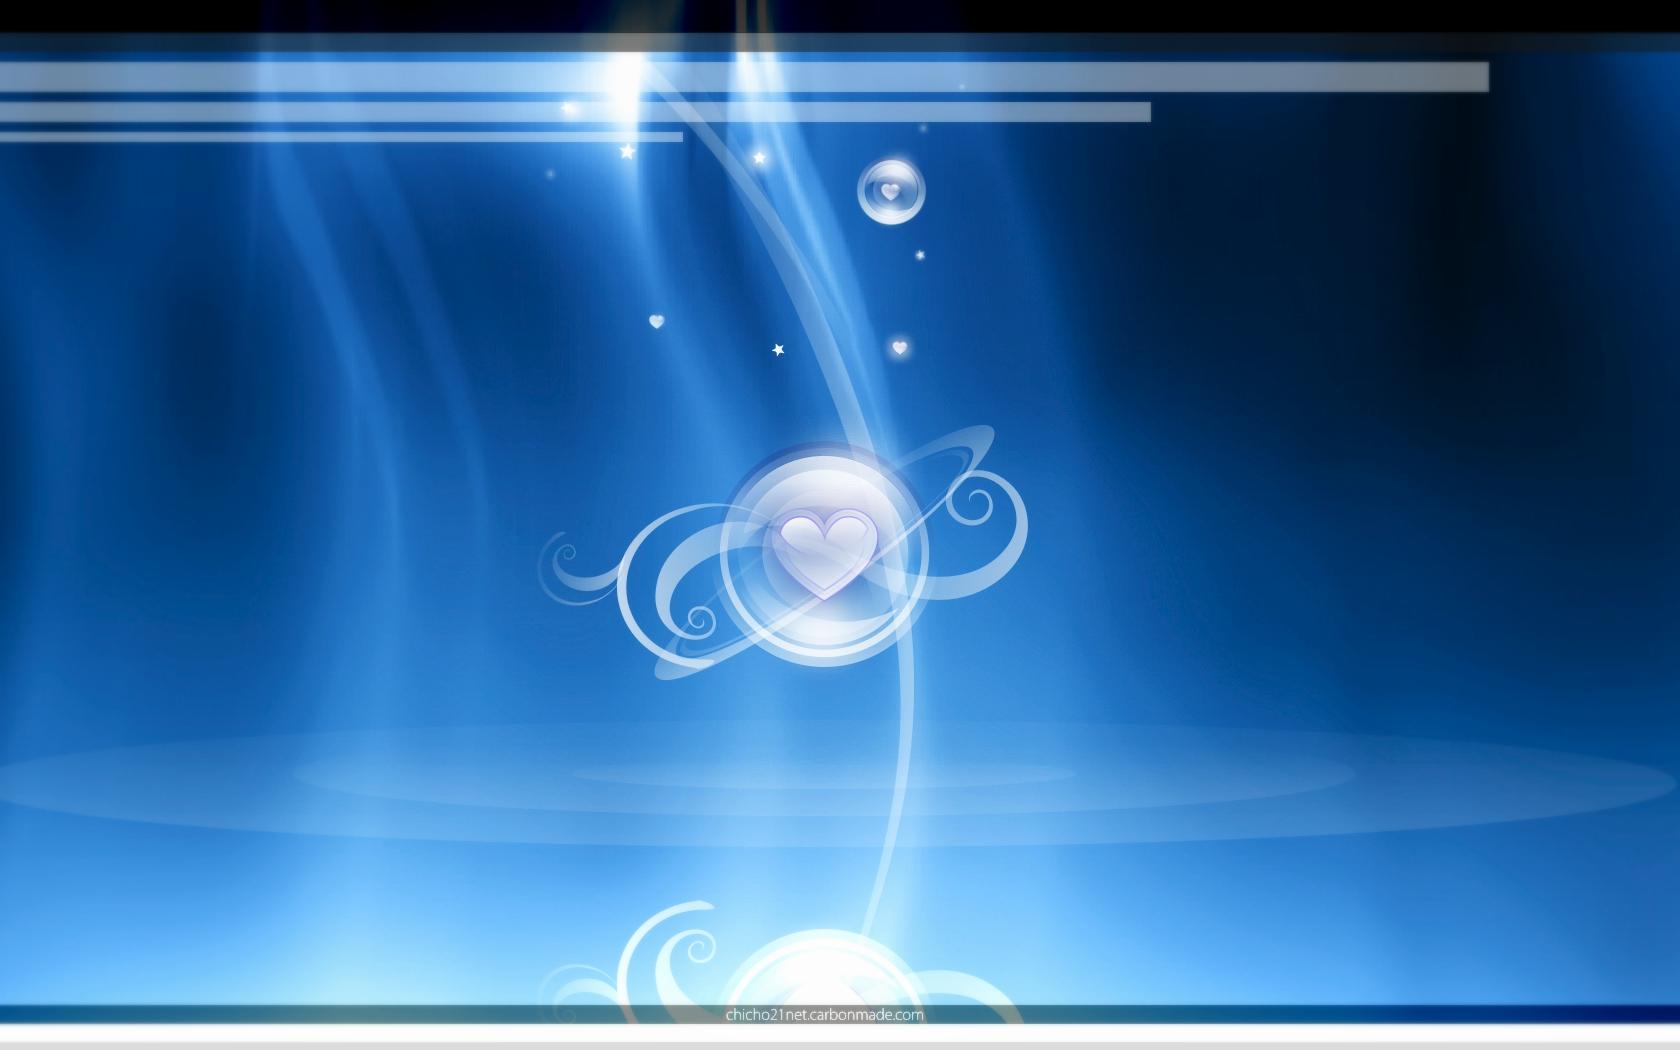 Bleu bleu l'amour